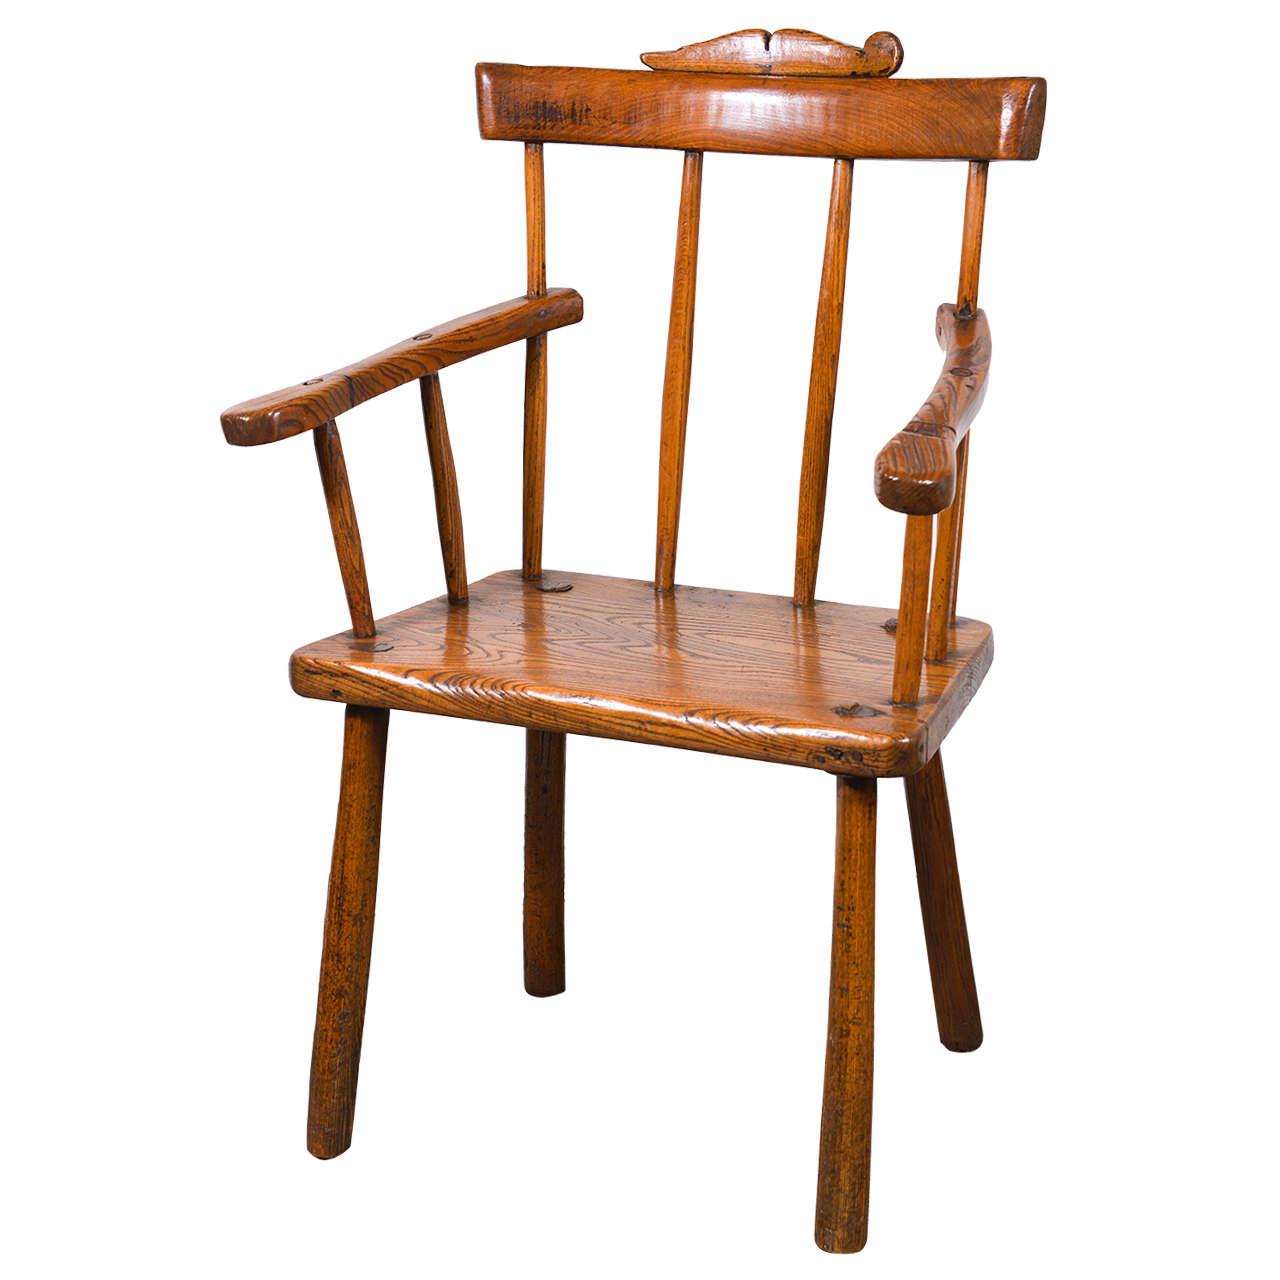 Primitive 18th Century Folk Art Chair